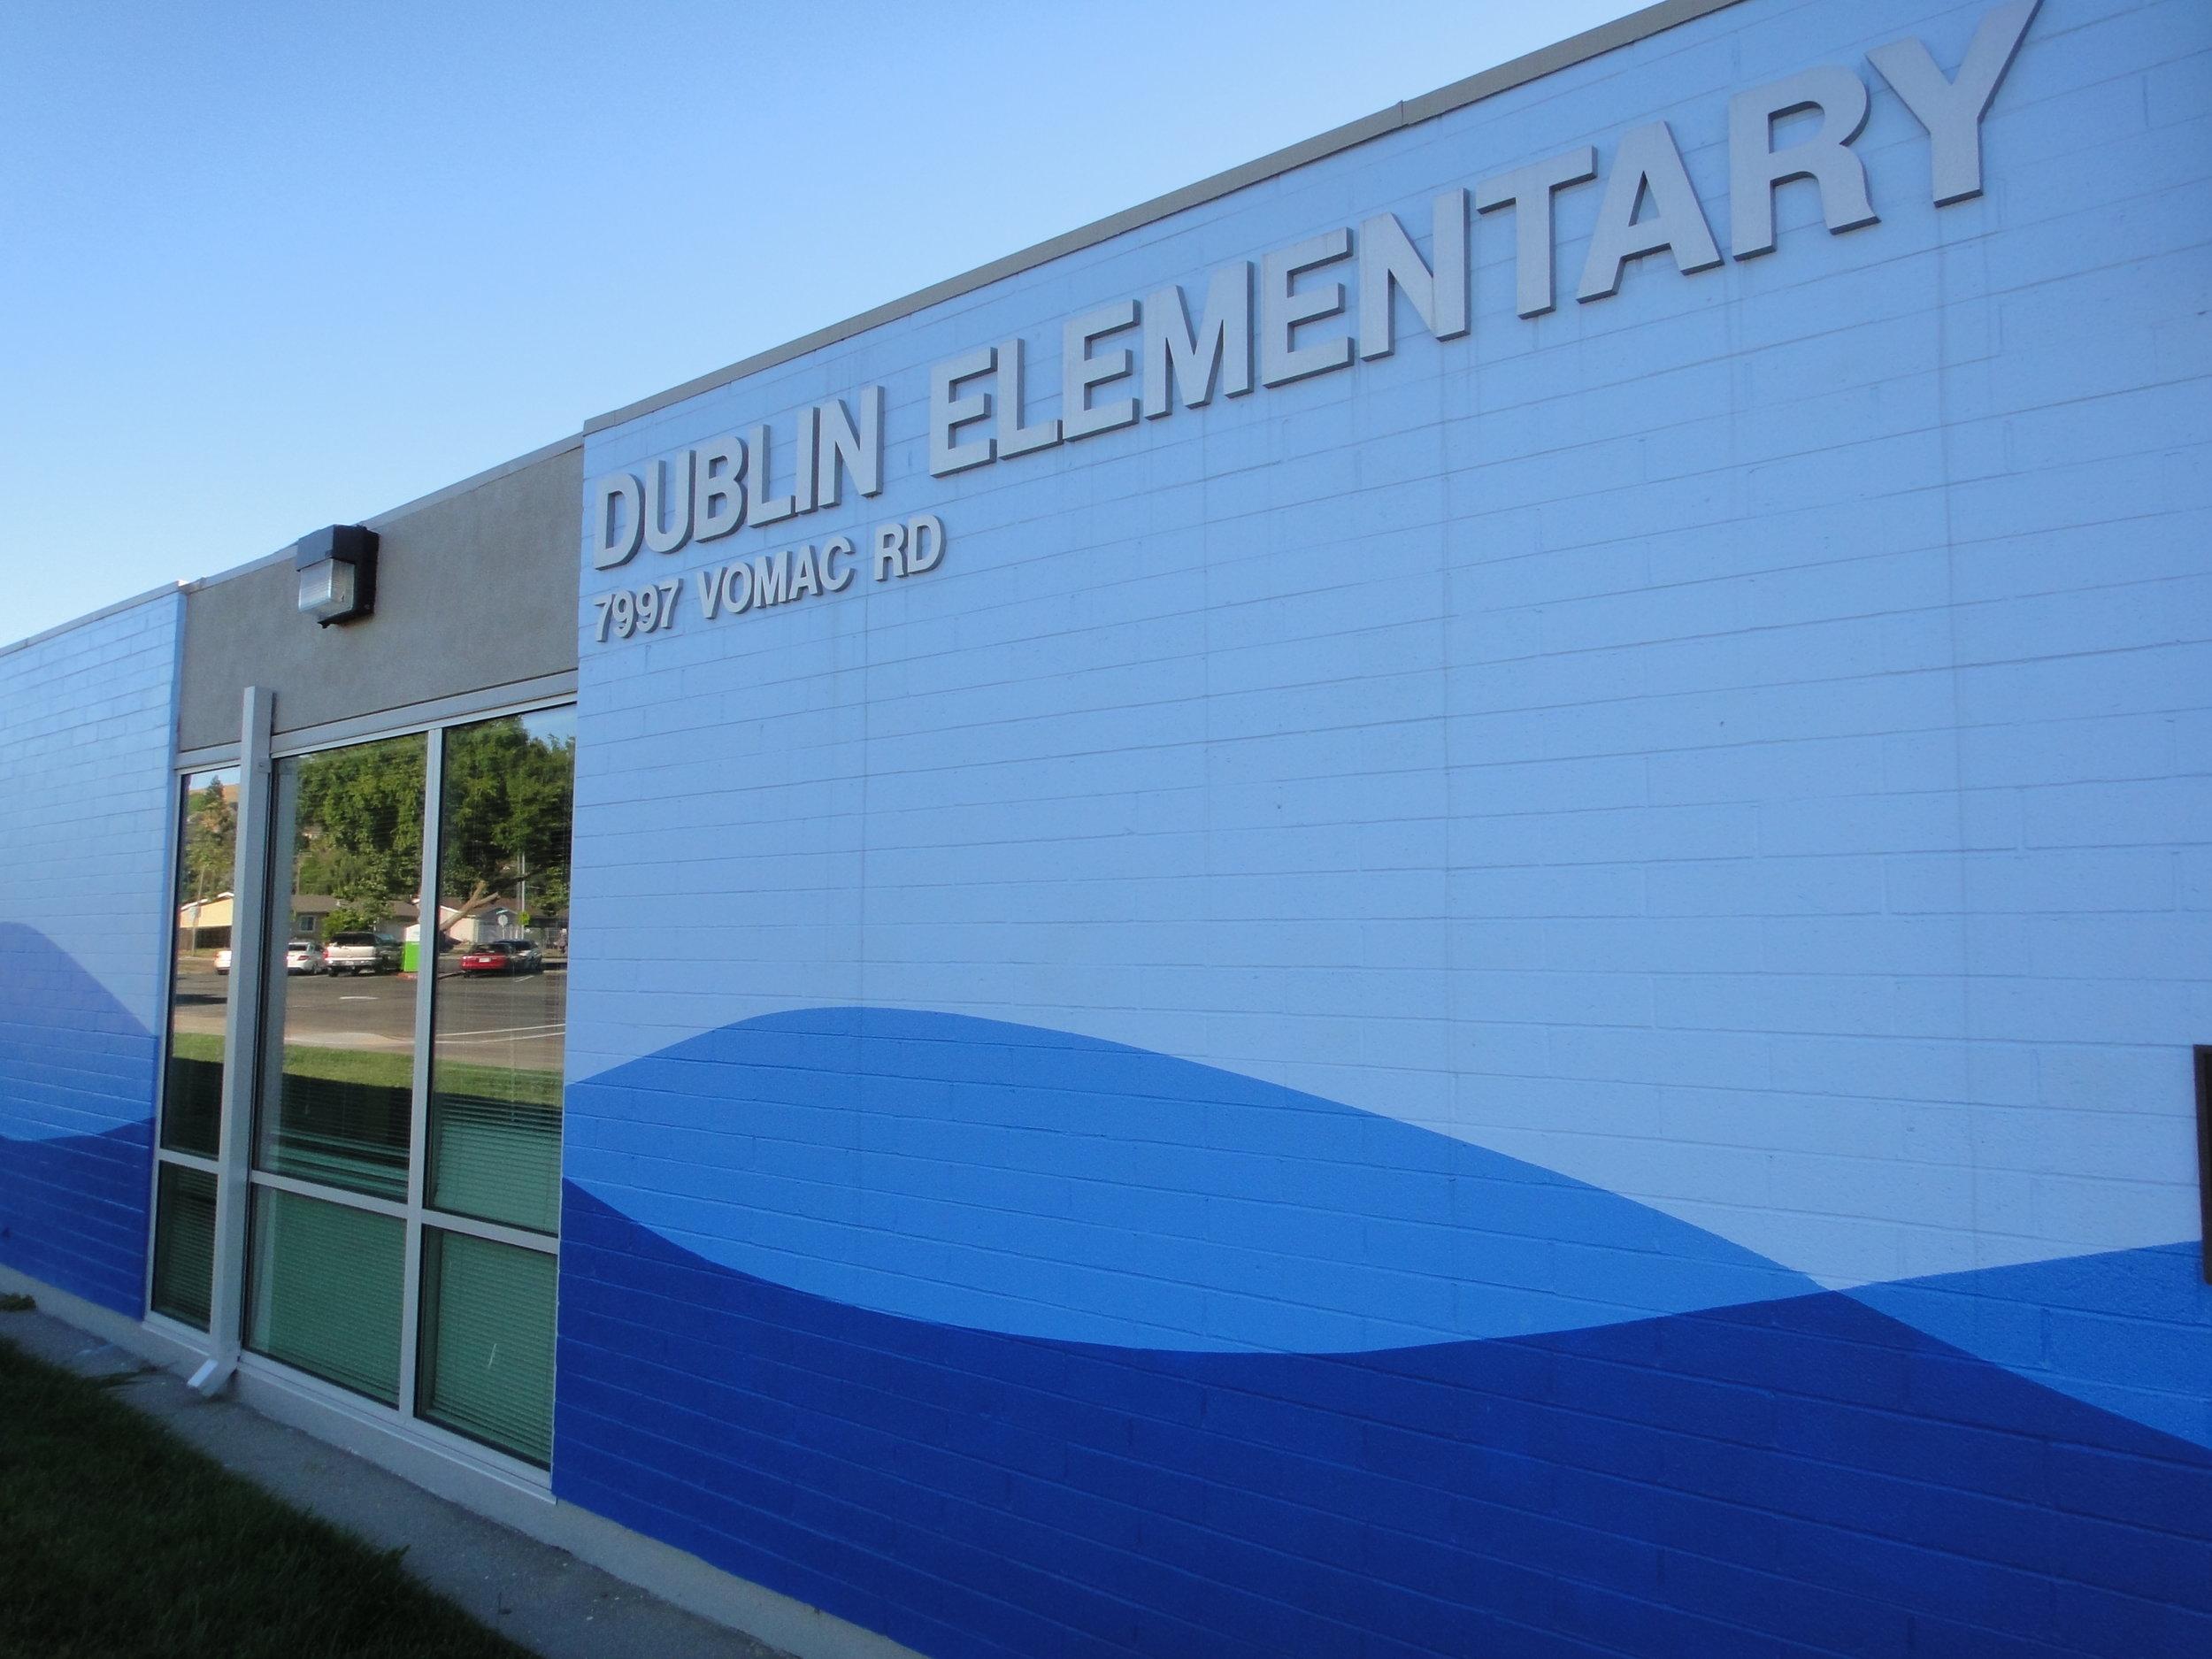 Dublin elementary school